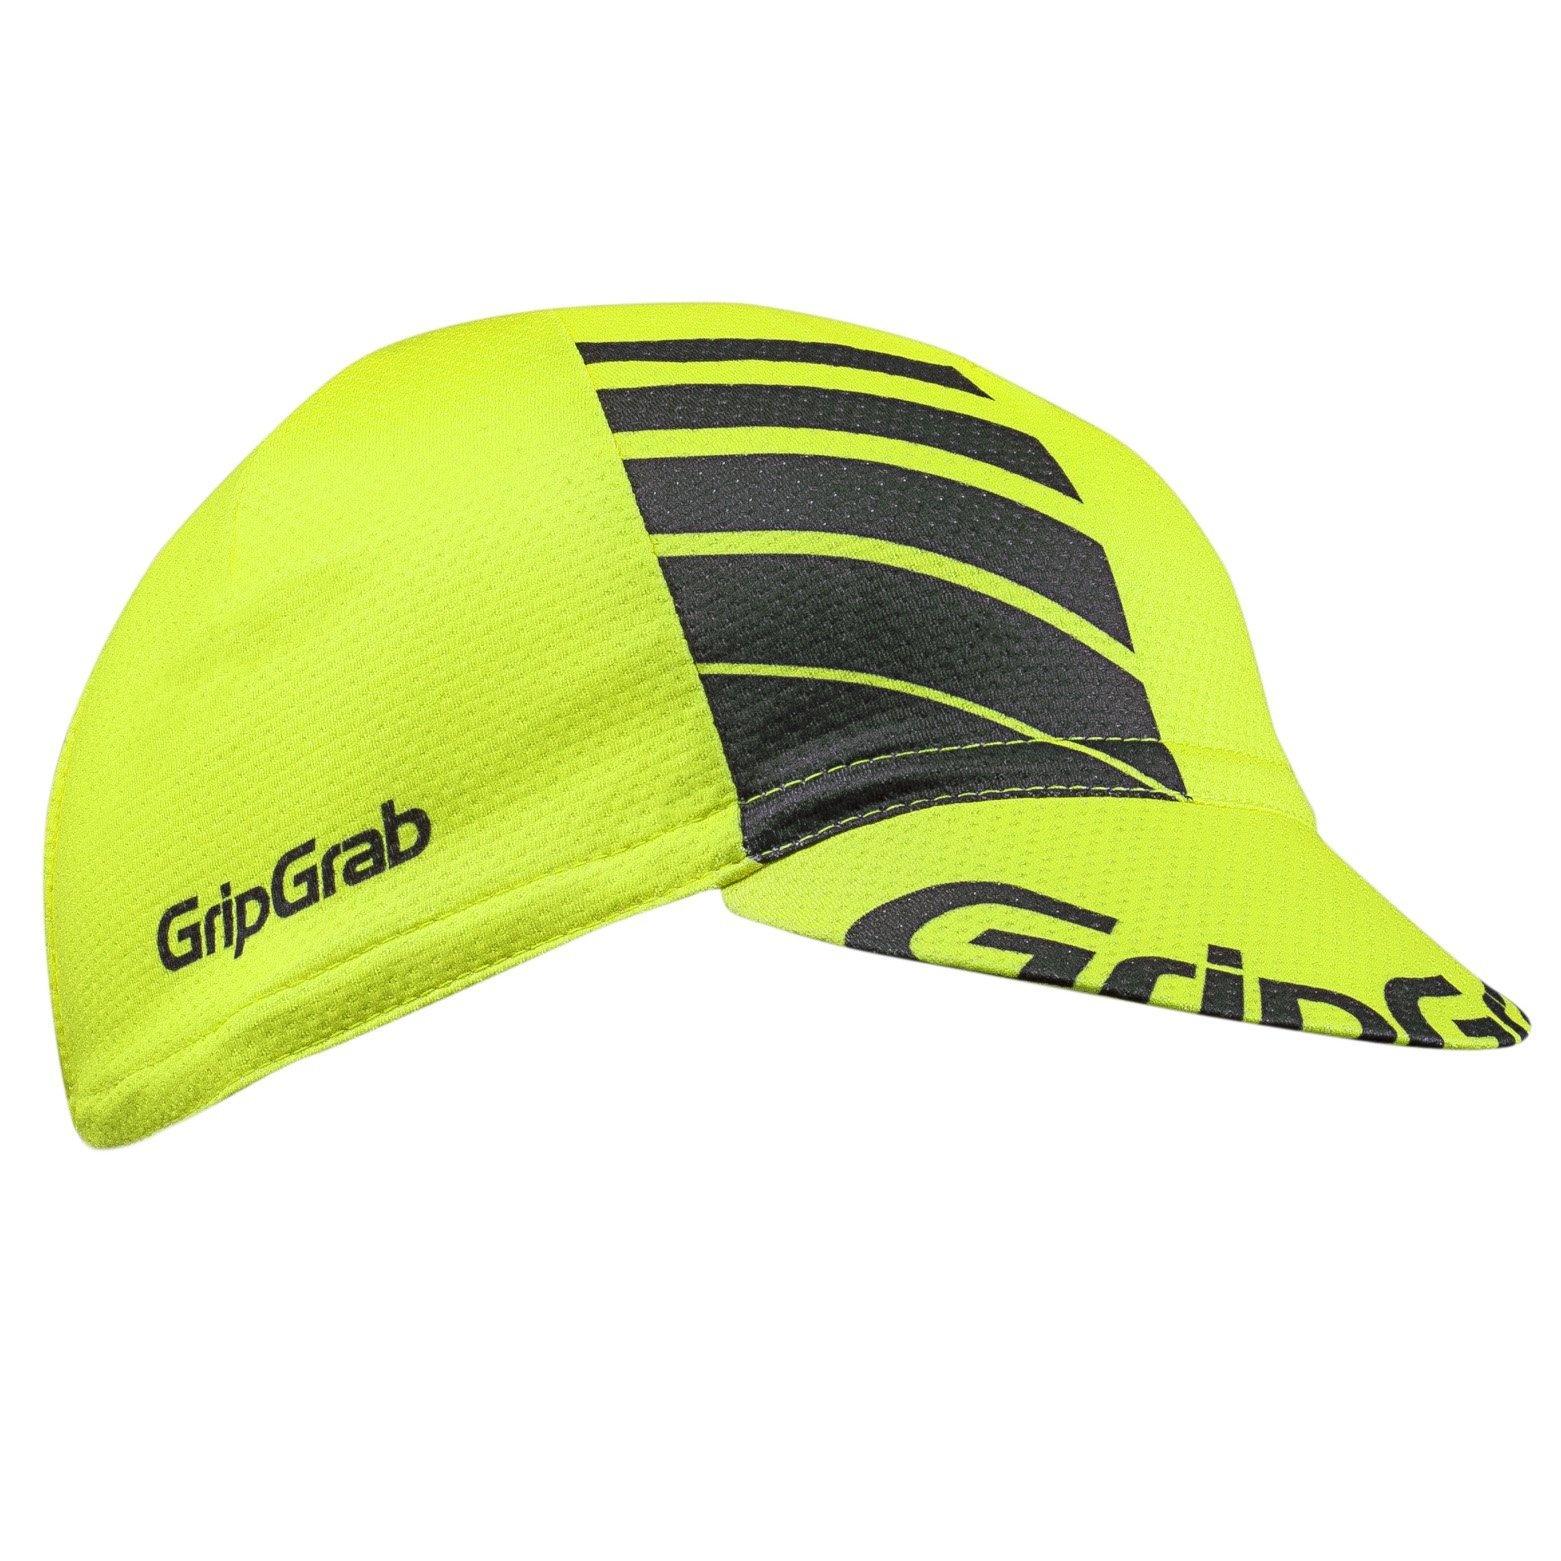 GripGrab Summer Cycling Cap Letvægts - Hi-Vis